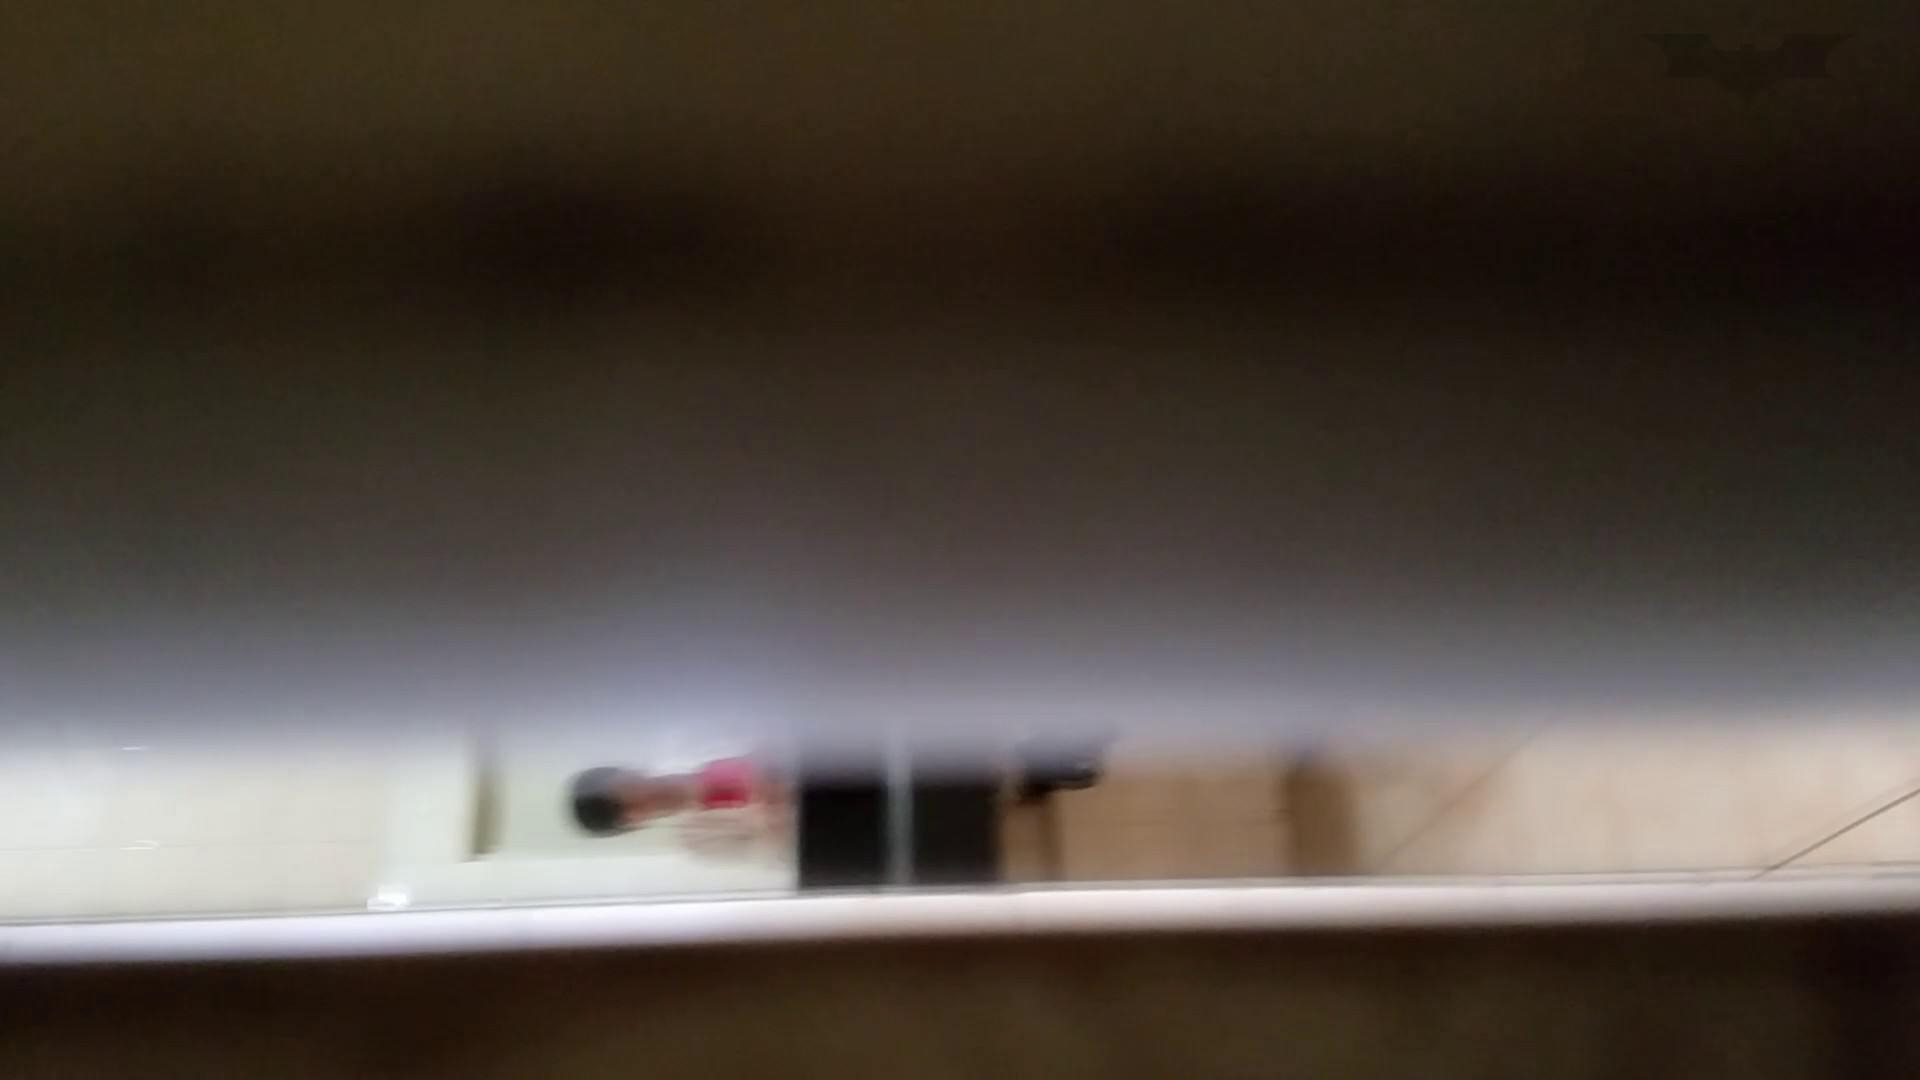 JD盗撮 美女の洗面所の秘密 Vol.75 洗面所 アダルト動画キャプチャ 110画像 82